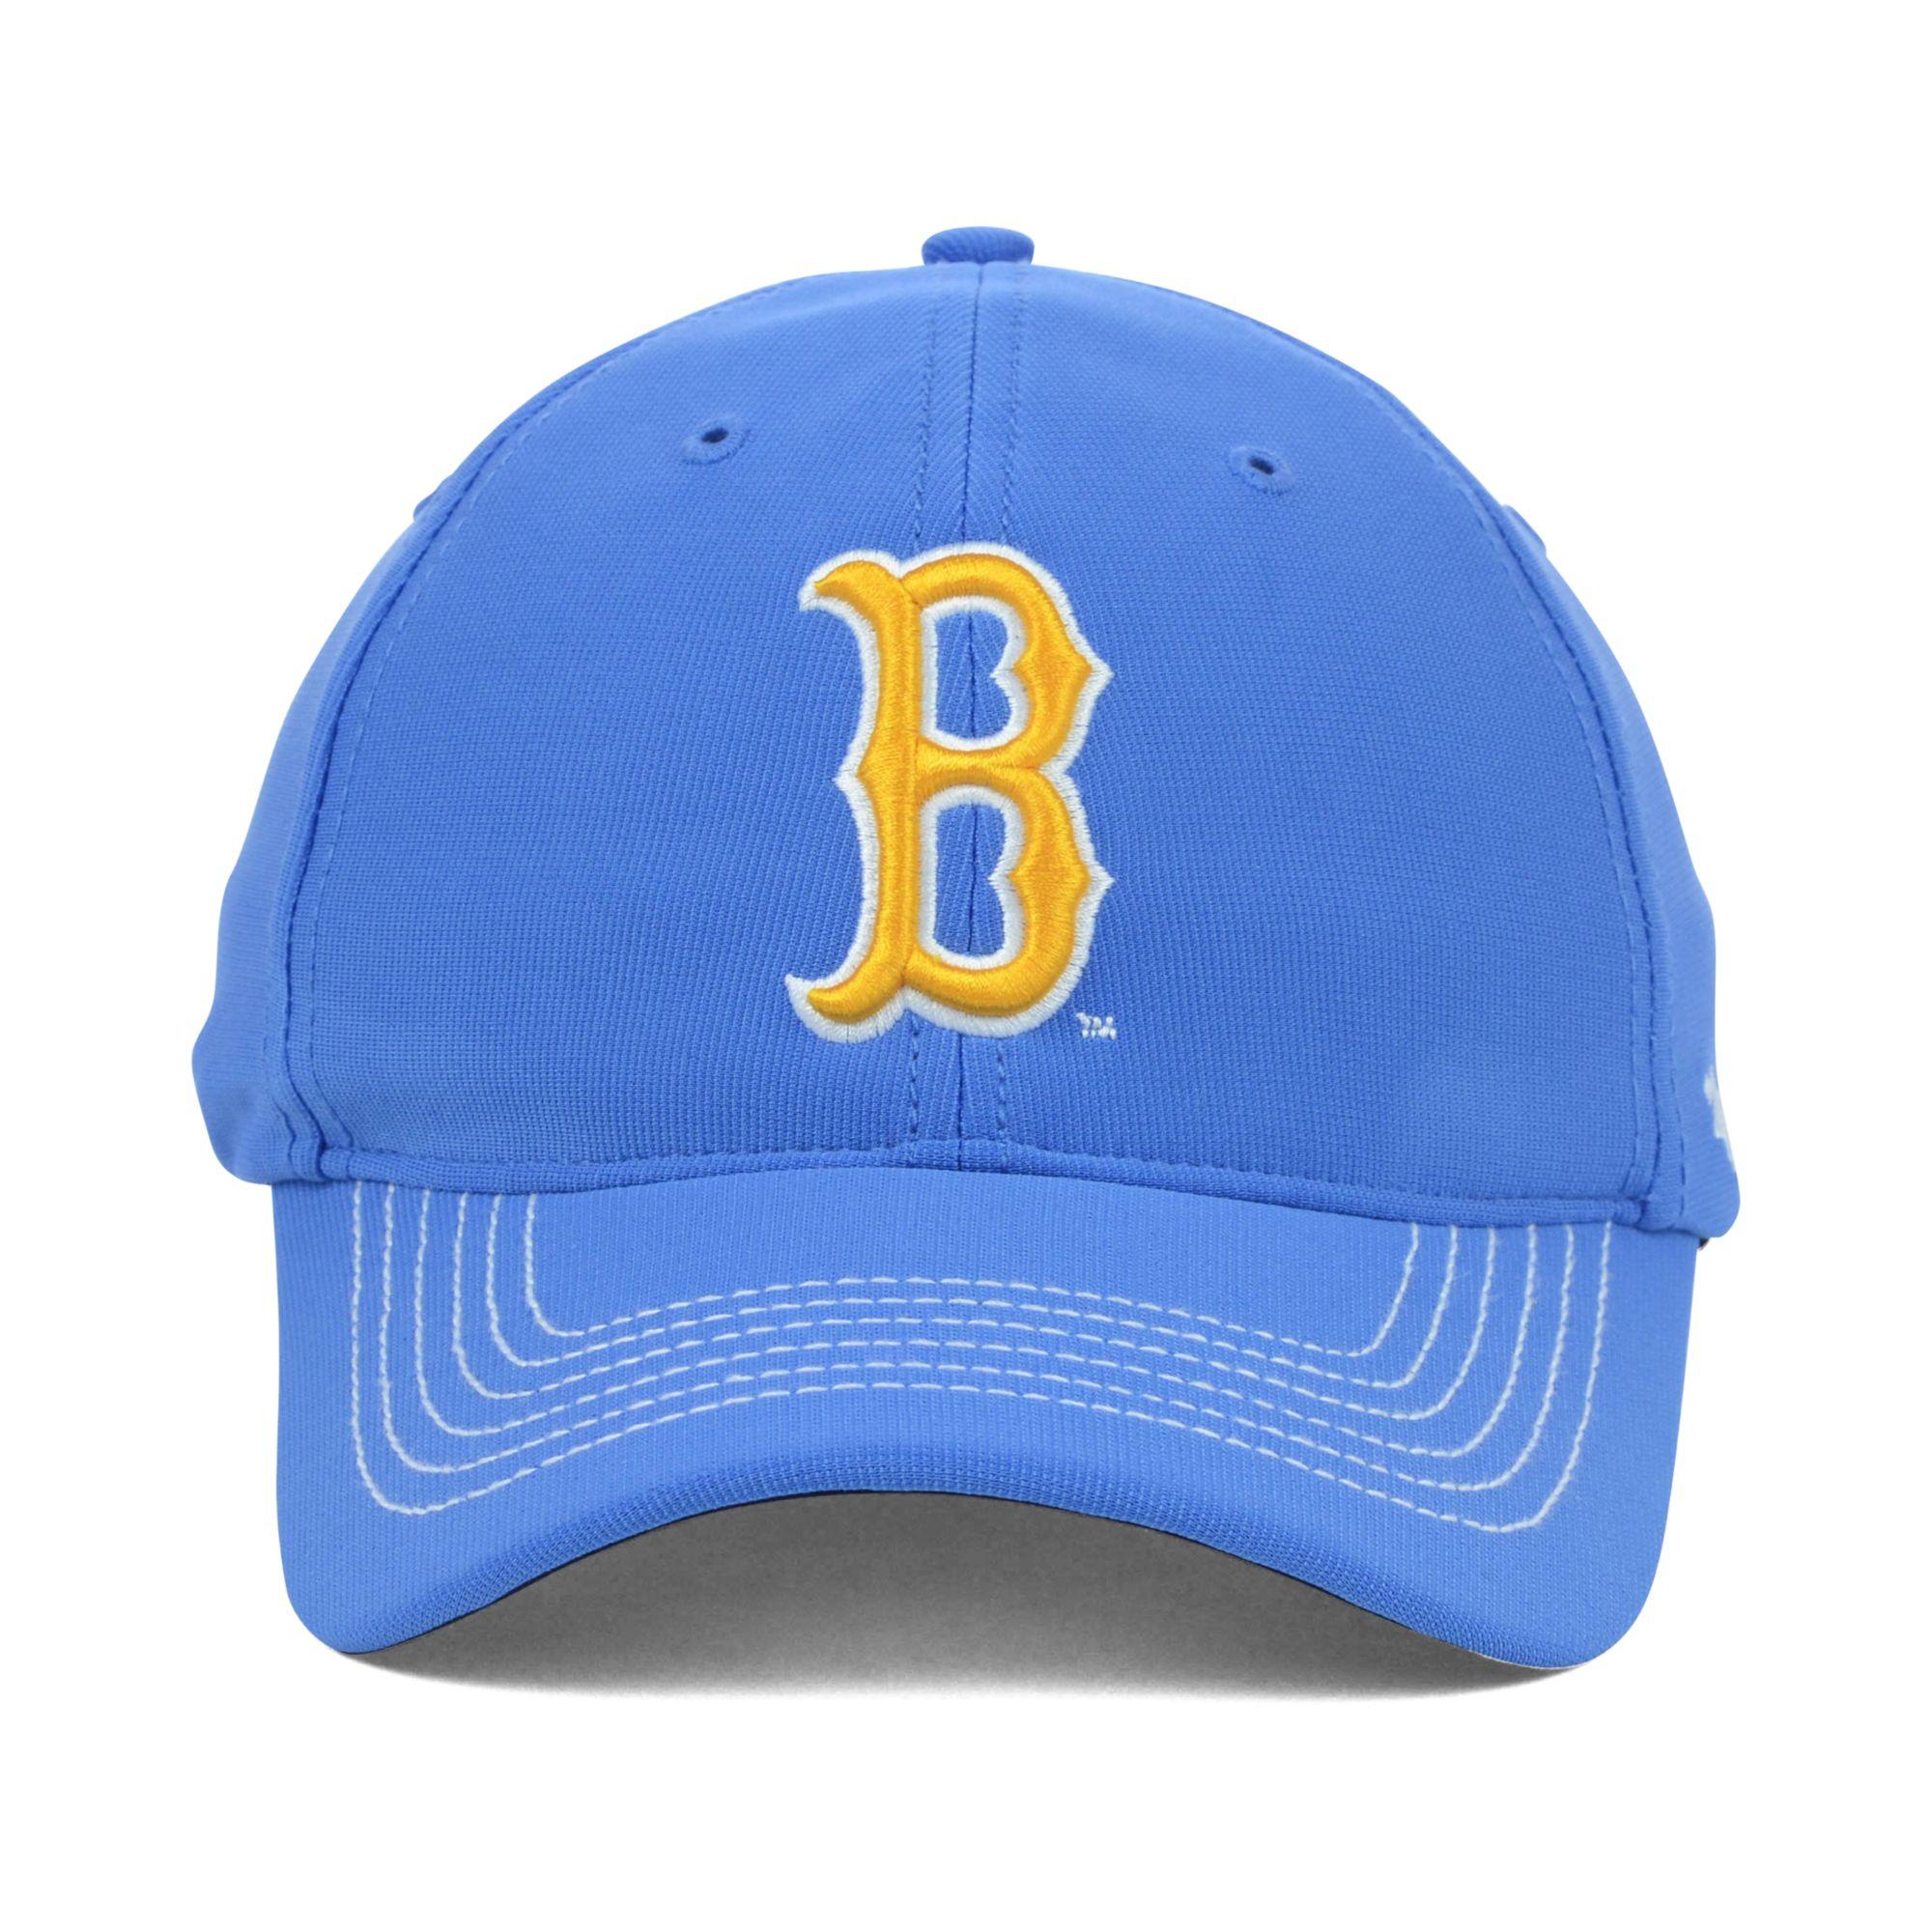 5f04864854e99 ... promo code lyst 47 brand ucla bruins ncaa gametime closer cap in blue  for men 3d8ae